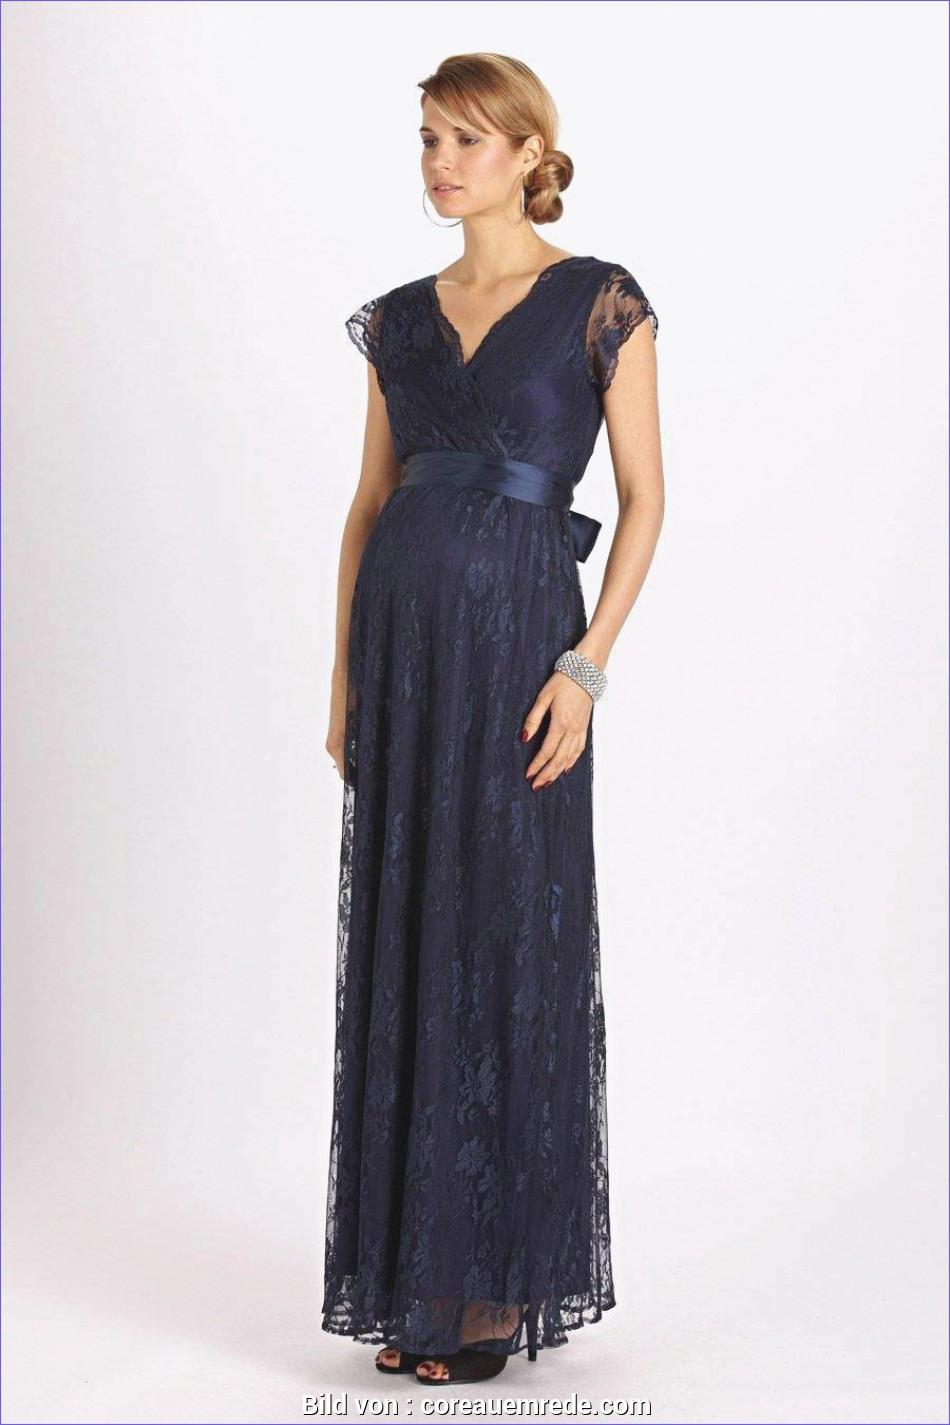 10 Fantastisch Umstandsmode Abendkleider Galerie15 Top Umstandsmode Abendkleider Ärmel